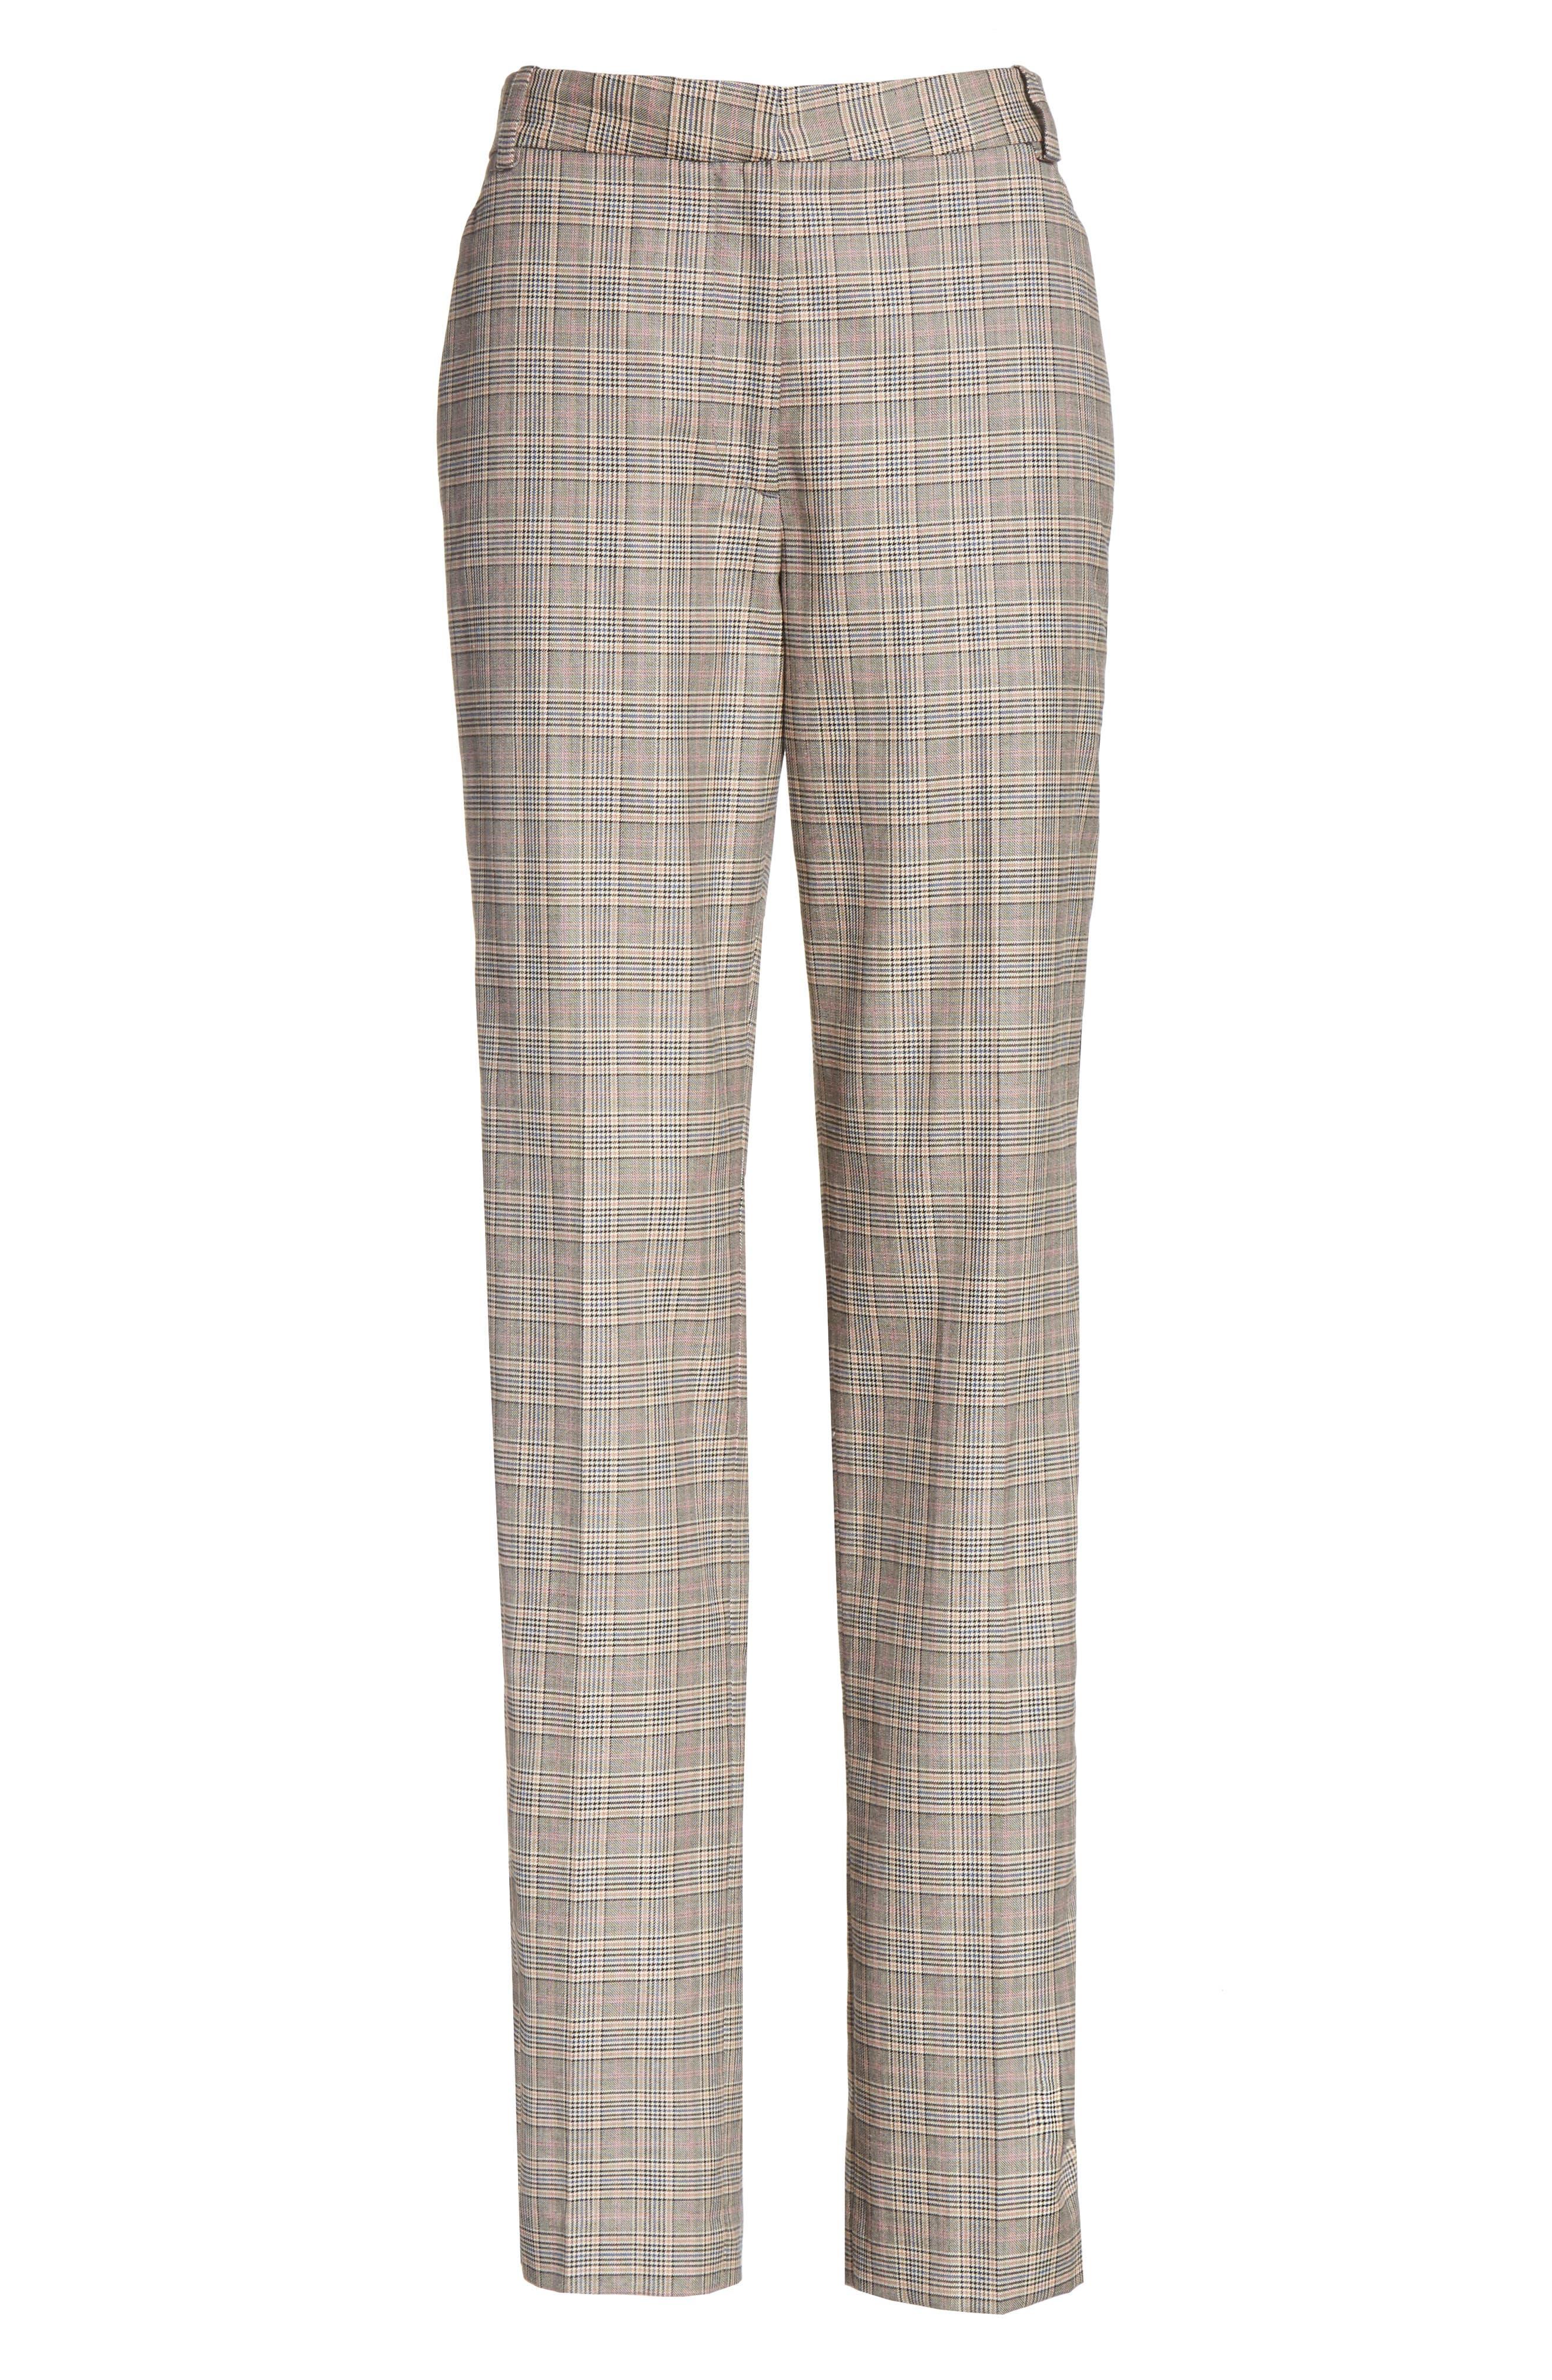 Oman Side Stripe Wool Blend Pants,                             Alternate thumbnail 6, color,                             017